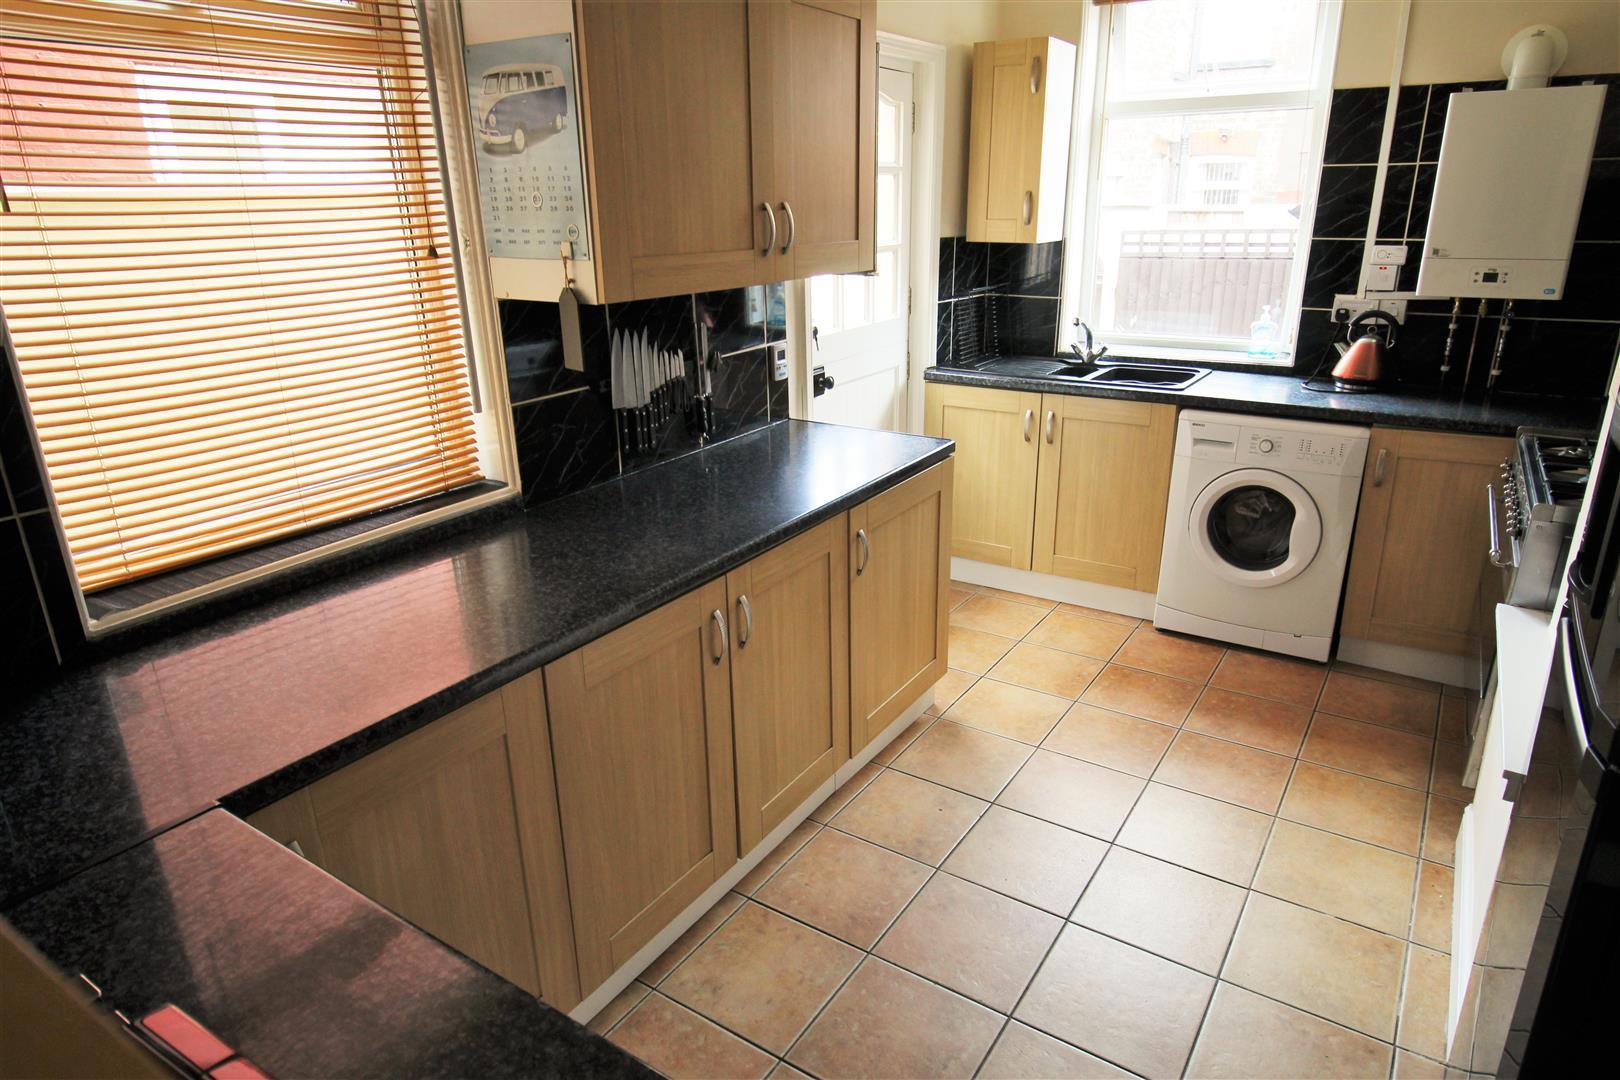 3 Bedrooms, House - Terraced, Gondover Avenue, Liverpool